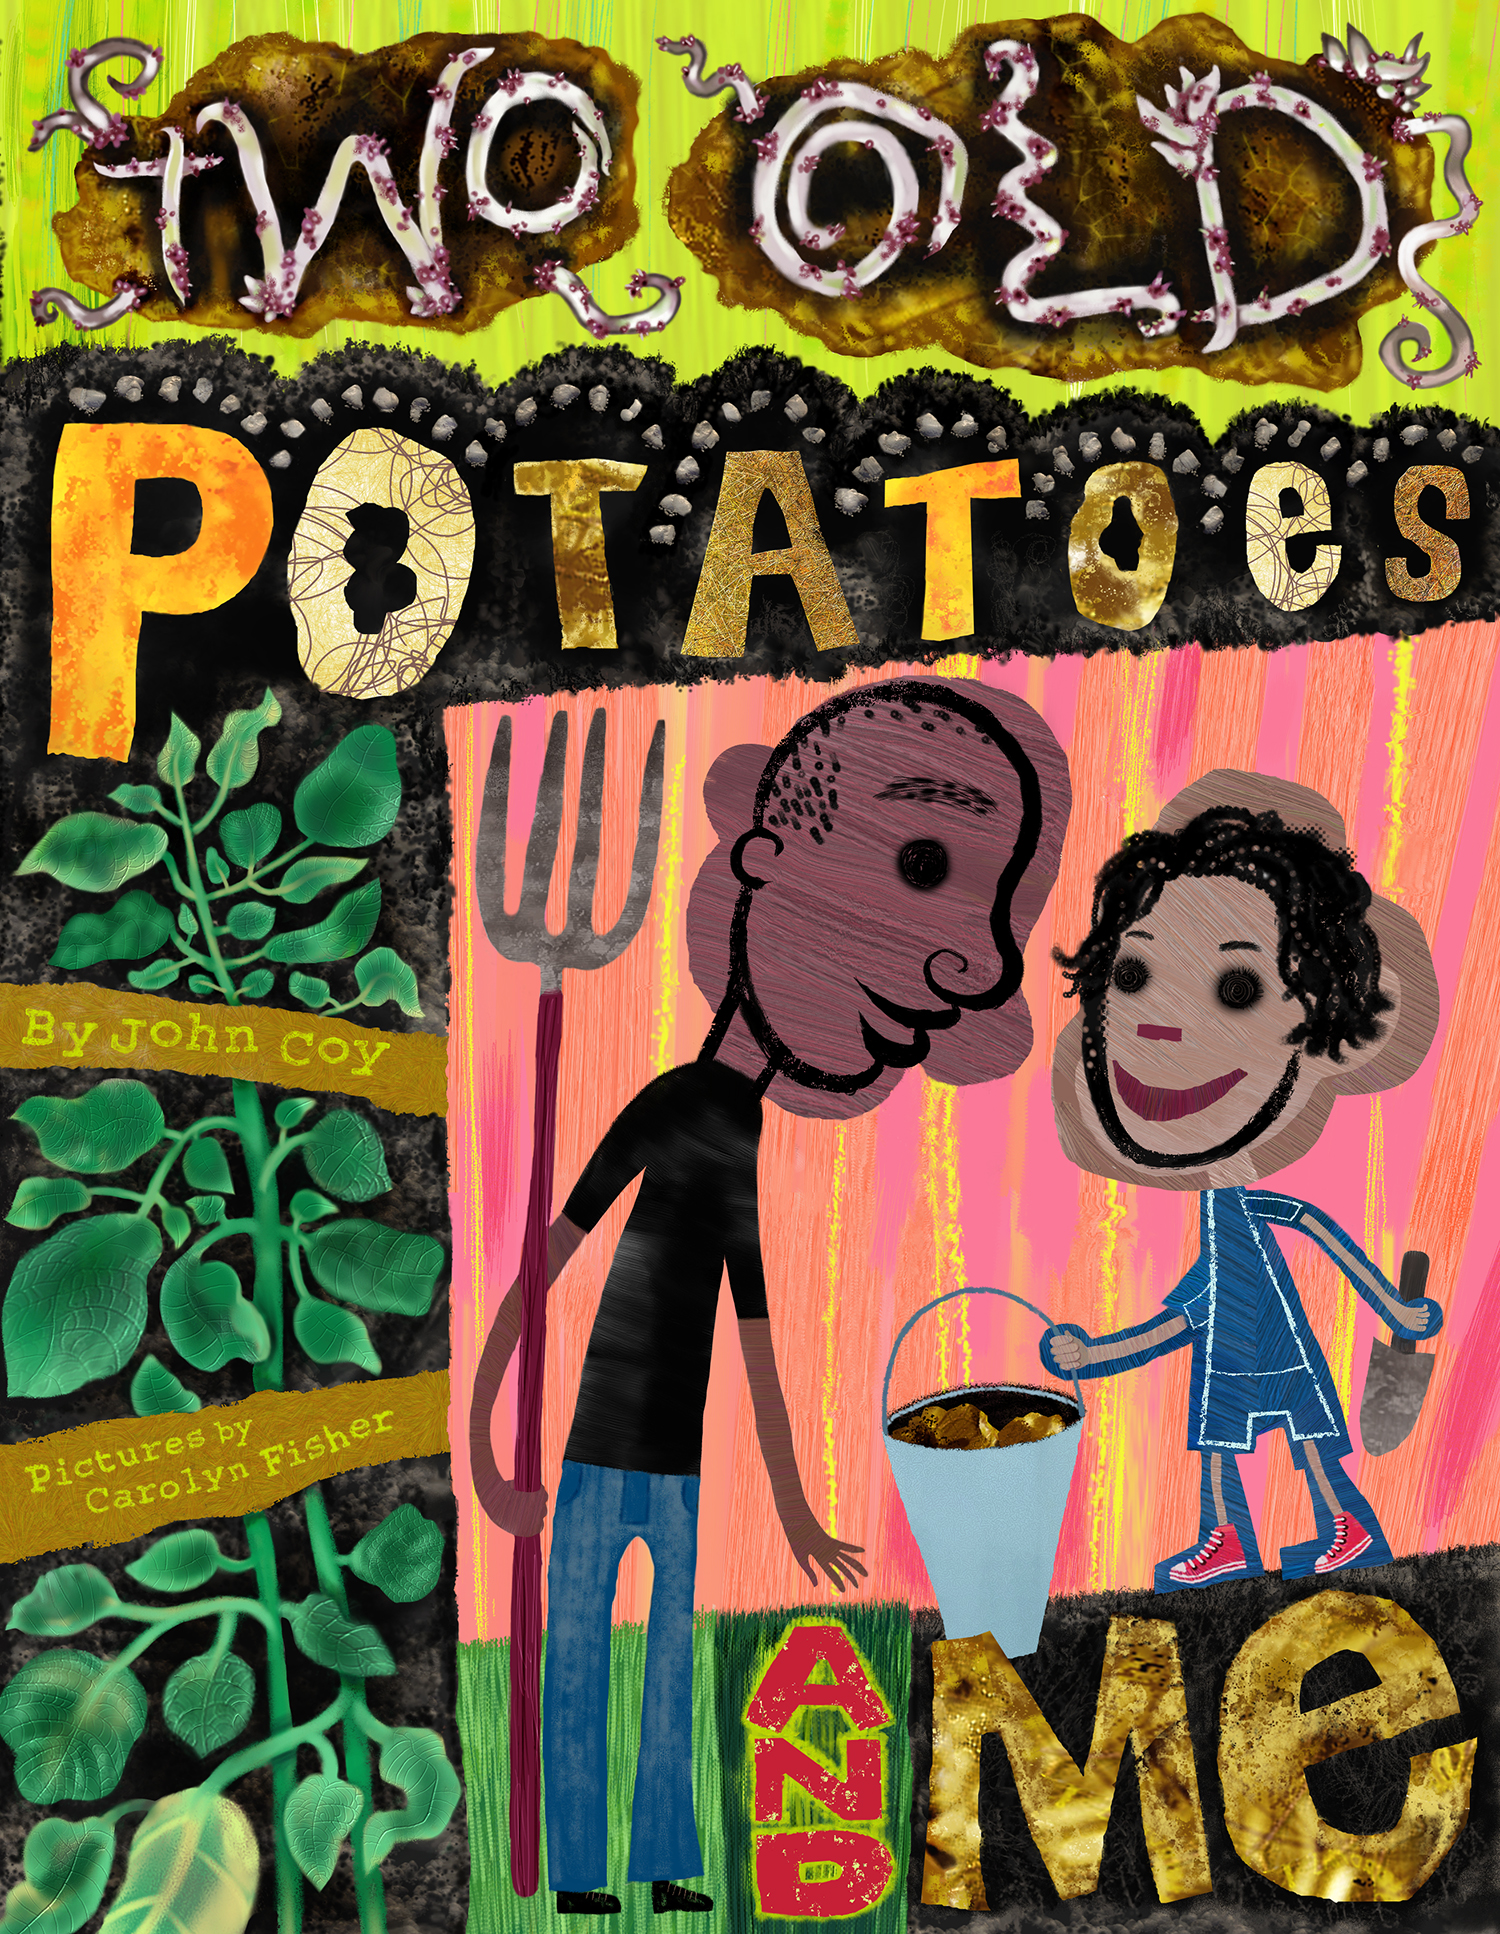 TwoOldPotatoes_cvr_byCarolynFisher_children'sbook_illustration_1500pxW_72d